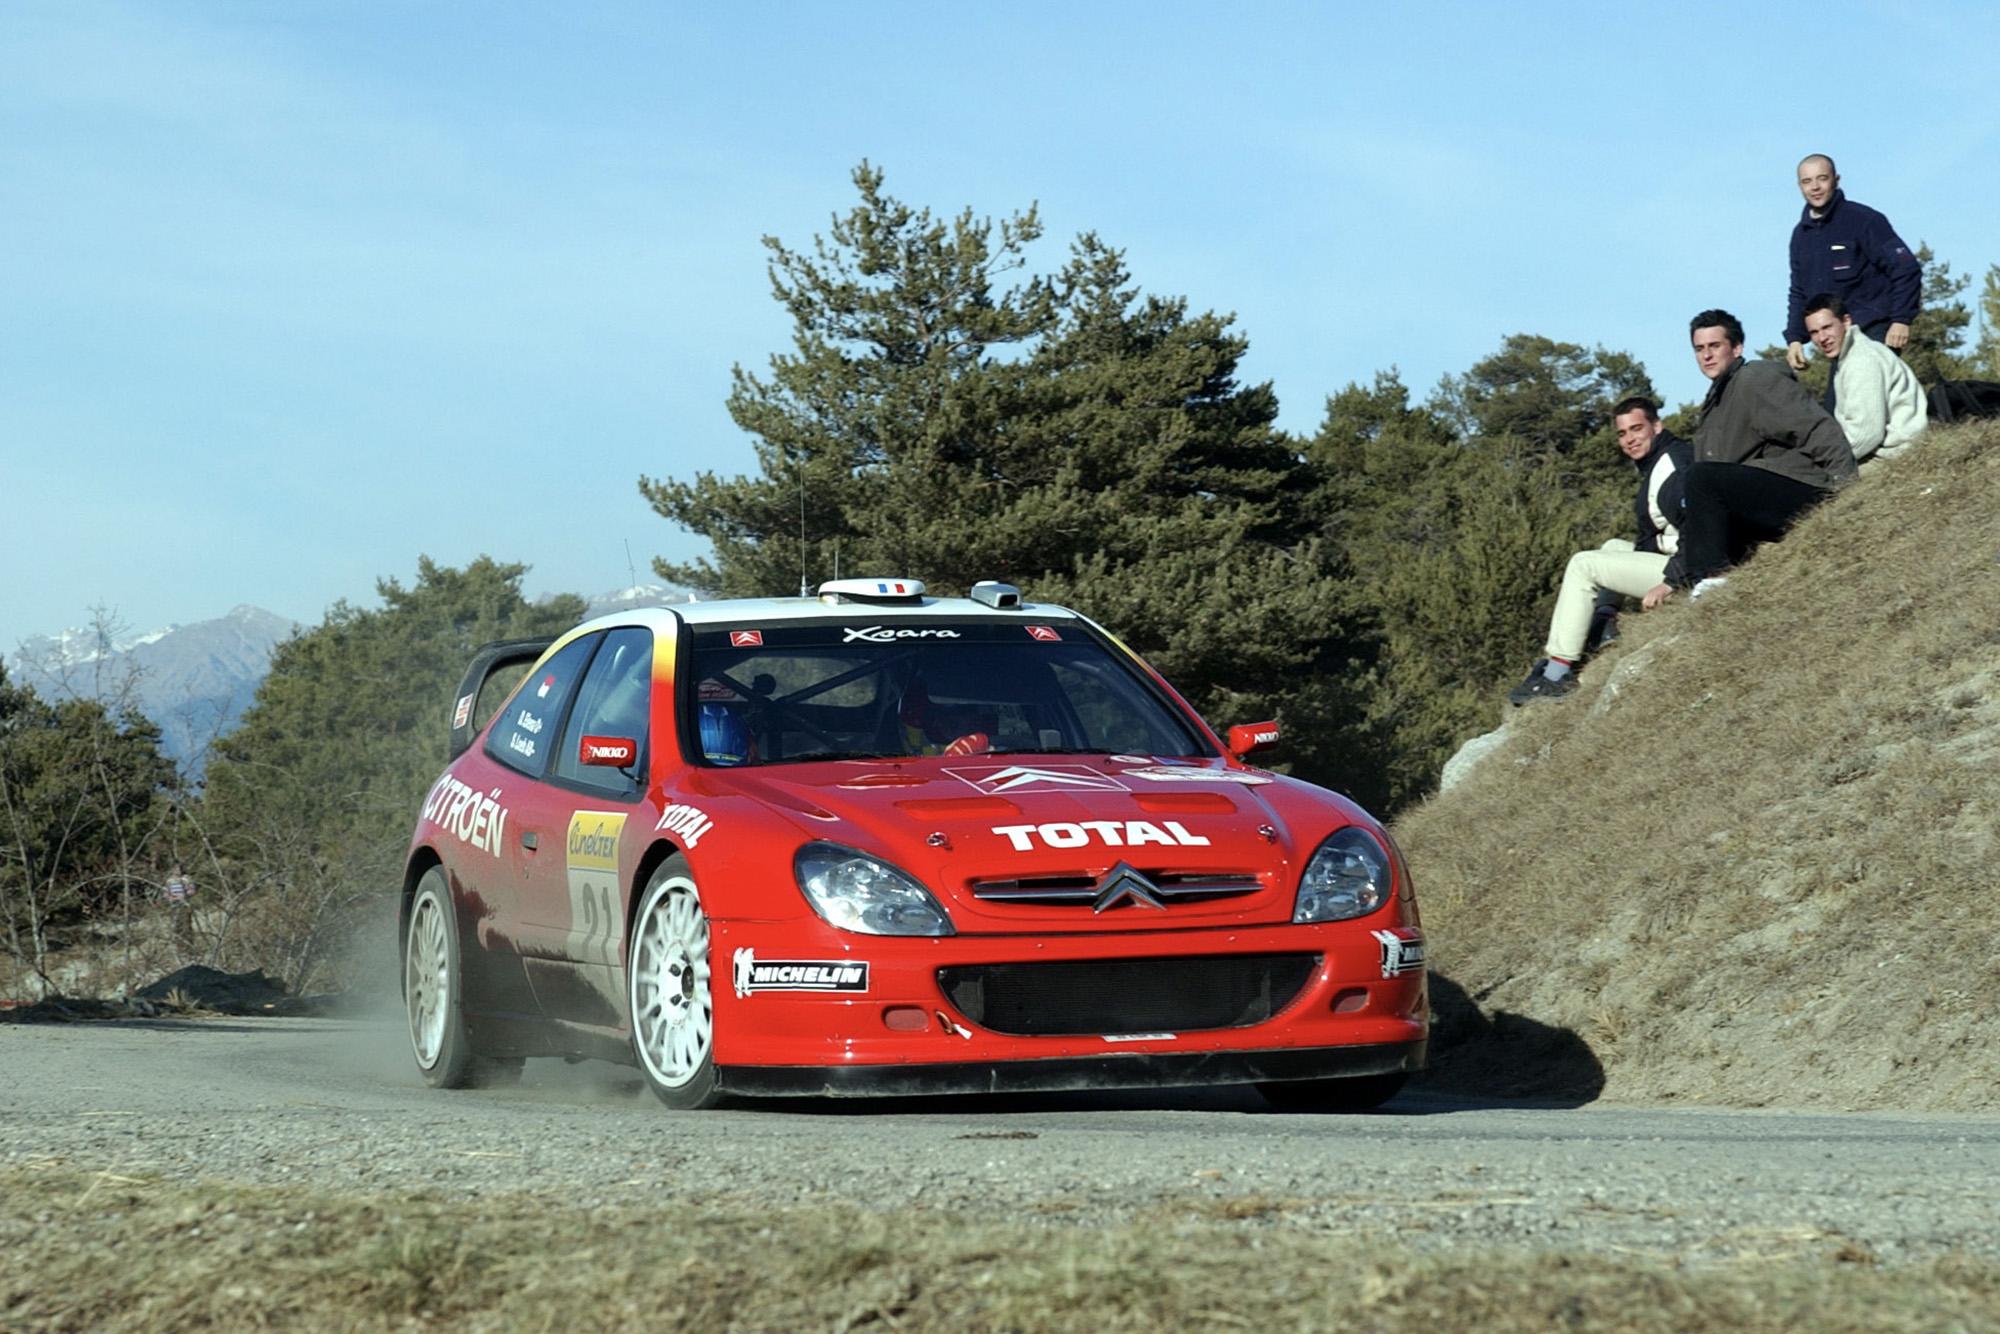 2002 Monte Carlo Rally: the arrival of Sebastien Loeb